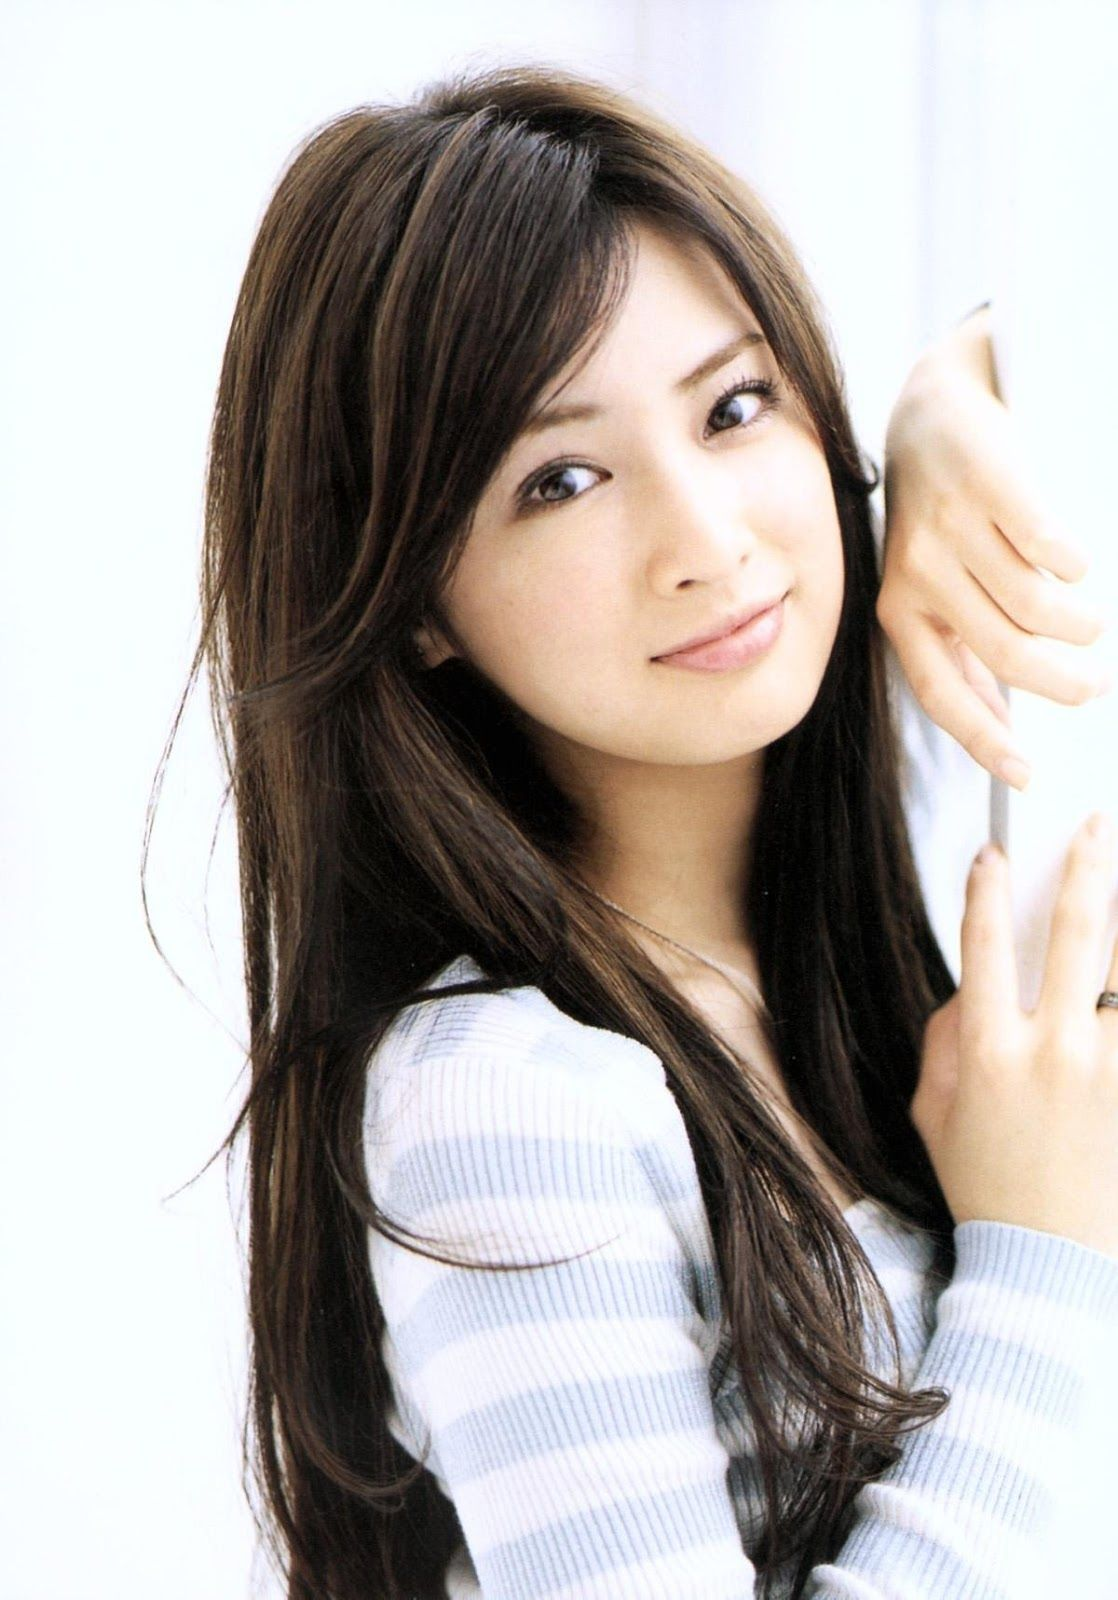 Keiko Kitagawa Is A Japanese Actress And Former Model Description